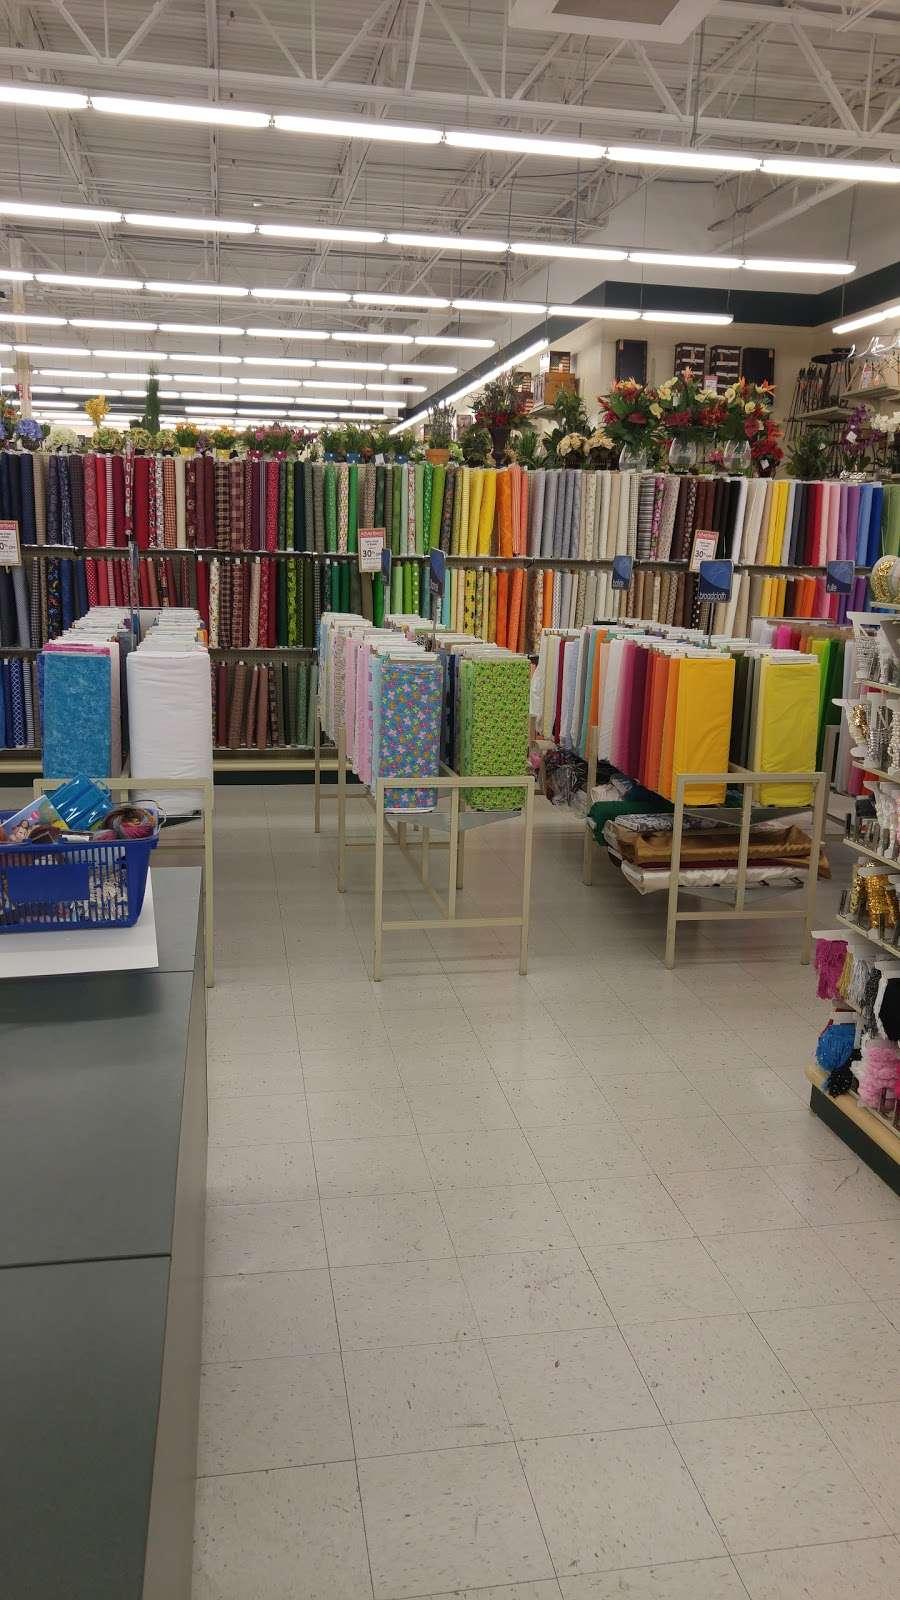 Hobby Lobby - home goods store  | Photo 1 of 10 | Address: 10575 E Washington St, Indianapolis, IN 46229, USA | Phone: (317) 897-1825